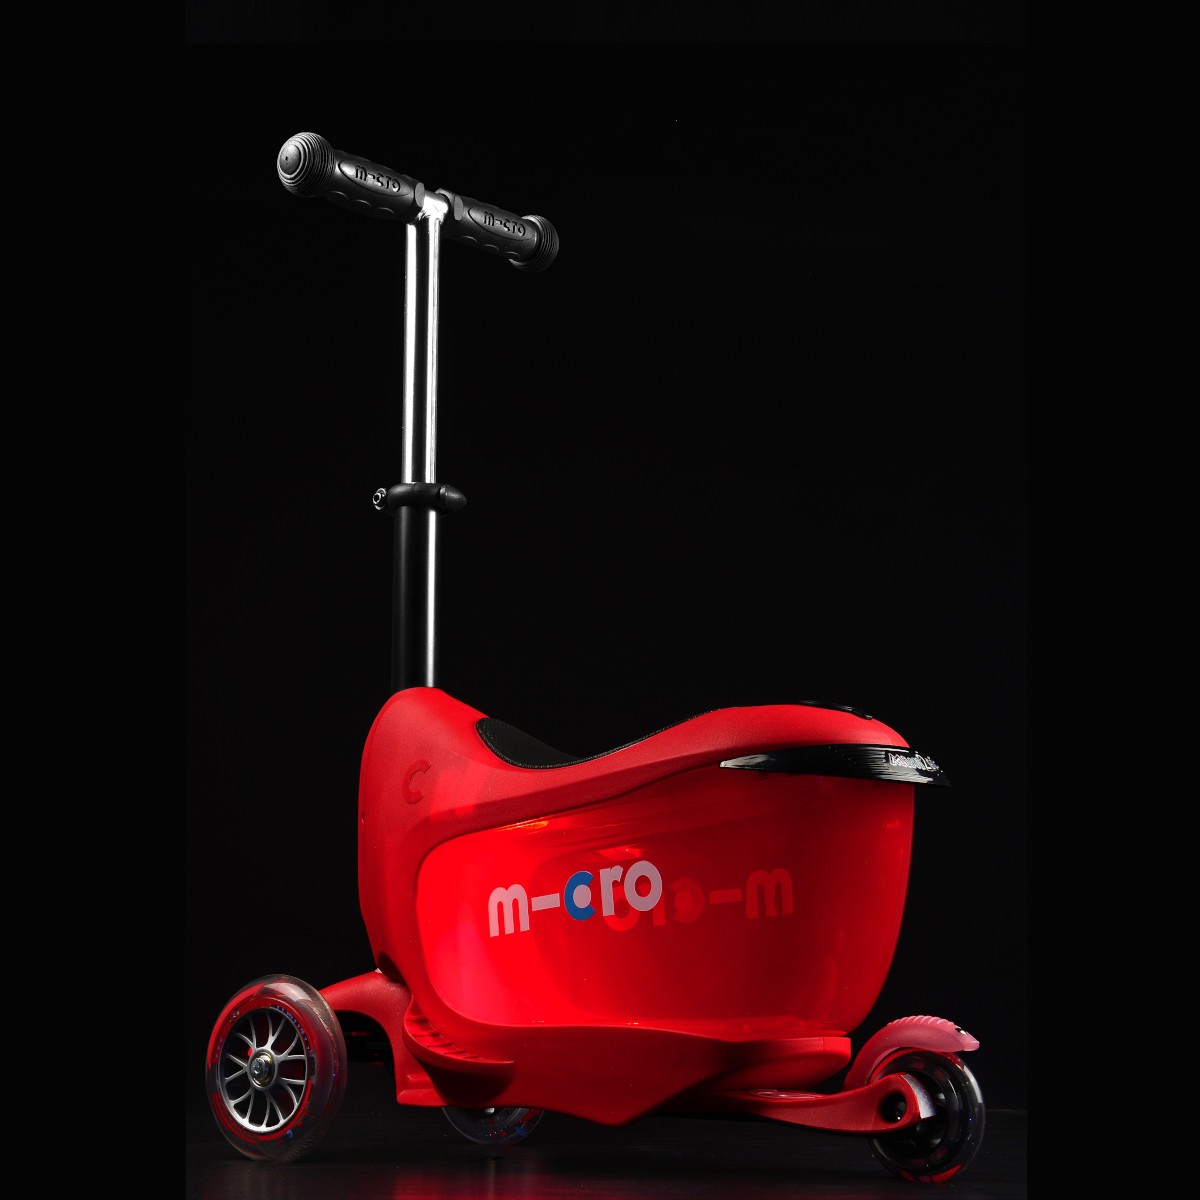 Micro Mini2go Deluxe Plus Red - 07